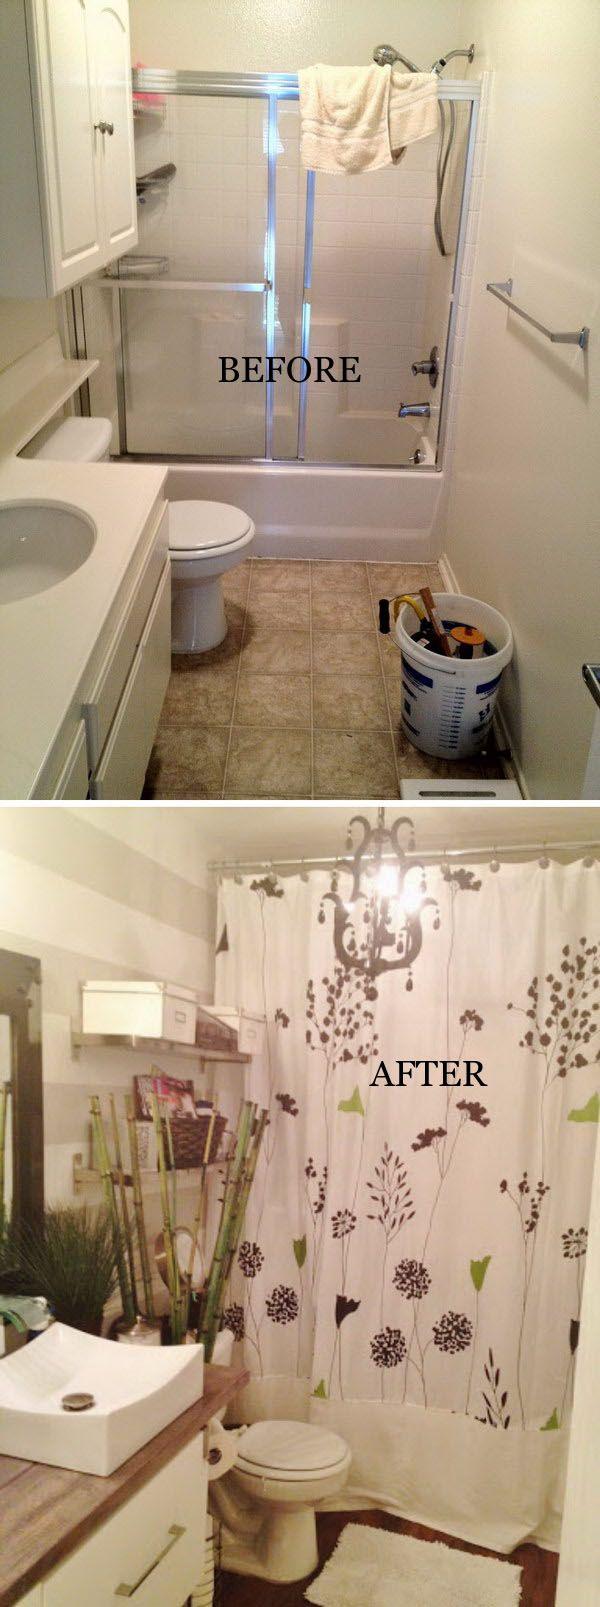 Bathroom Makeovers For Less best 25+ budget bathroom remodel ideas on pinterest | budget